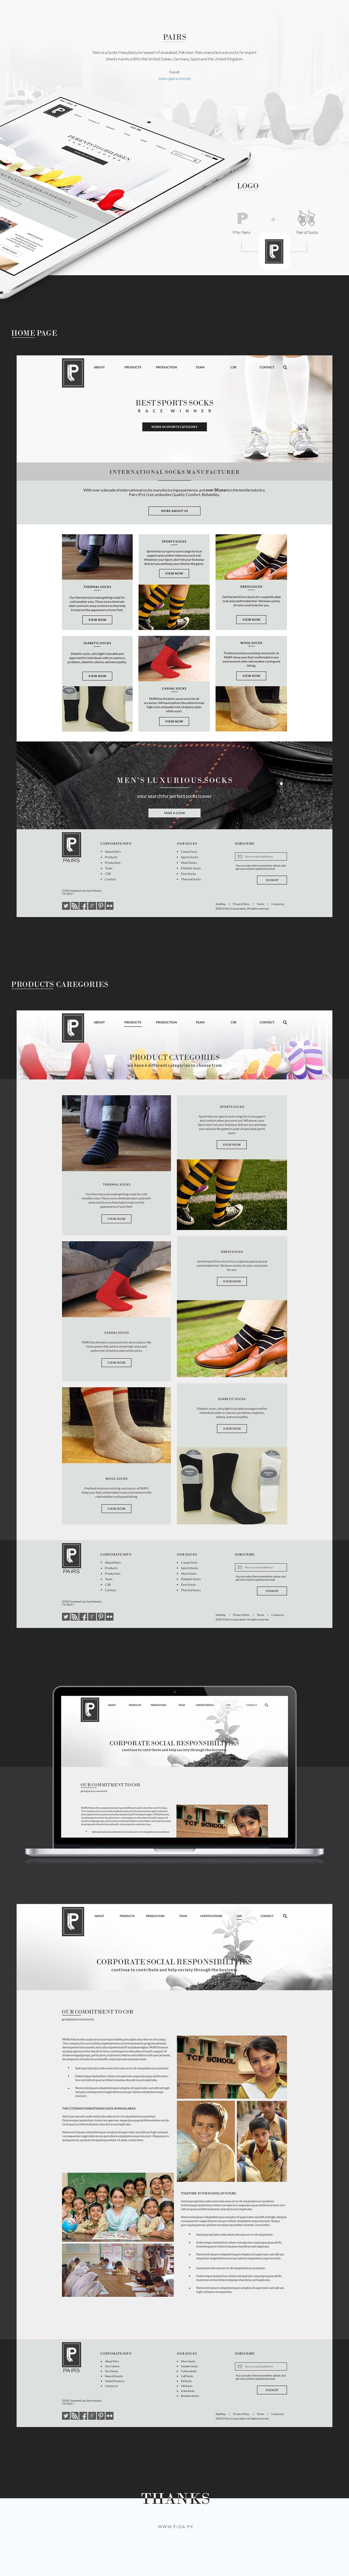 pairs Webdesign Logo Design logo socks Pakistan islamabad Website UI